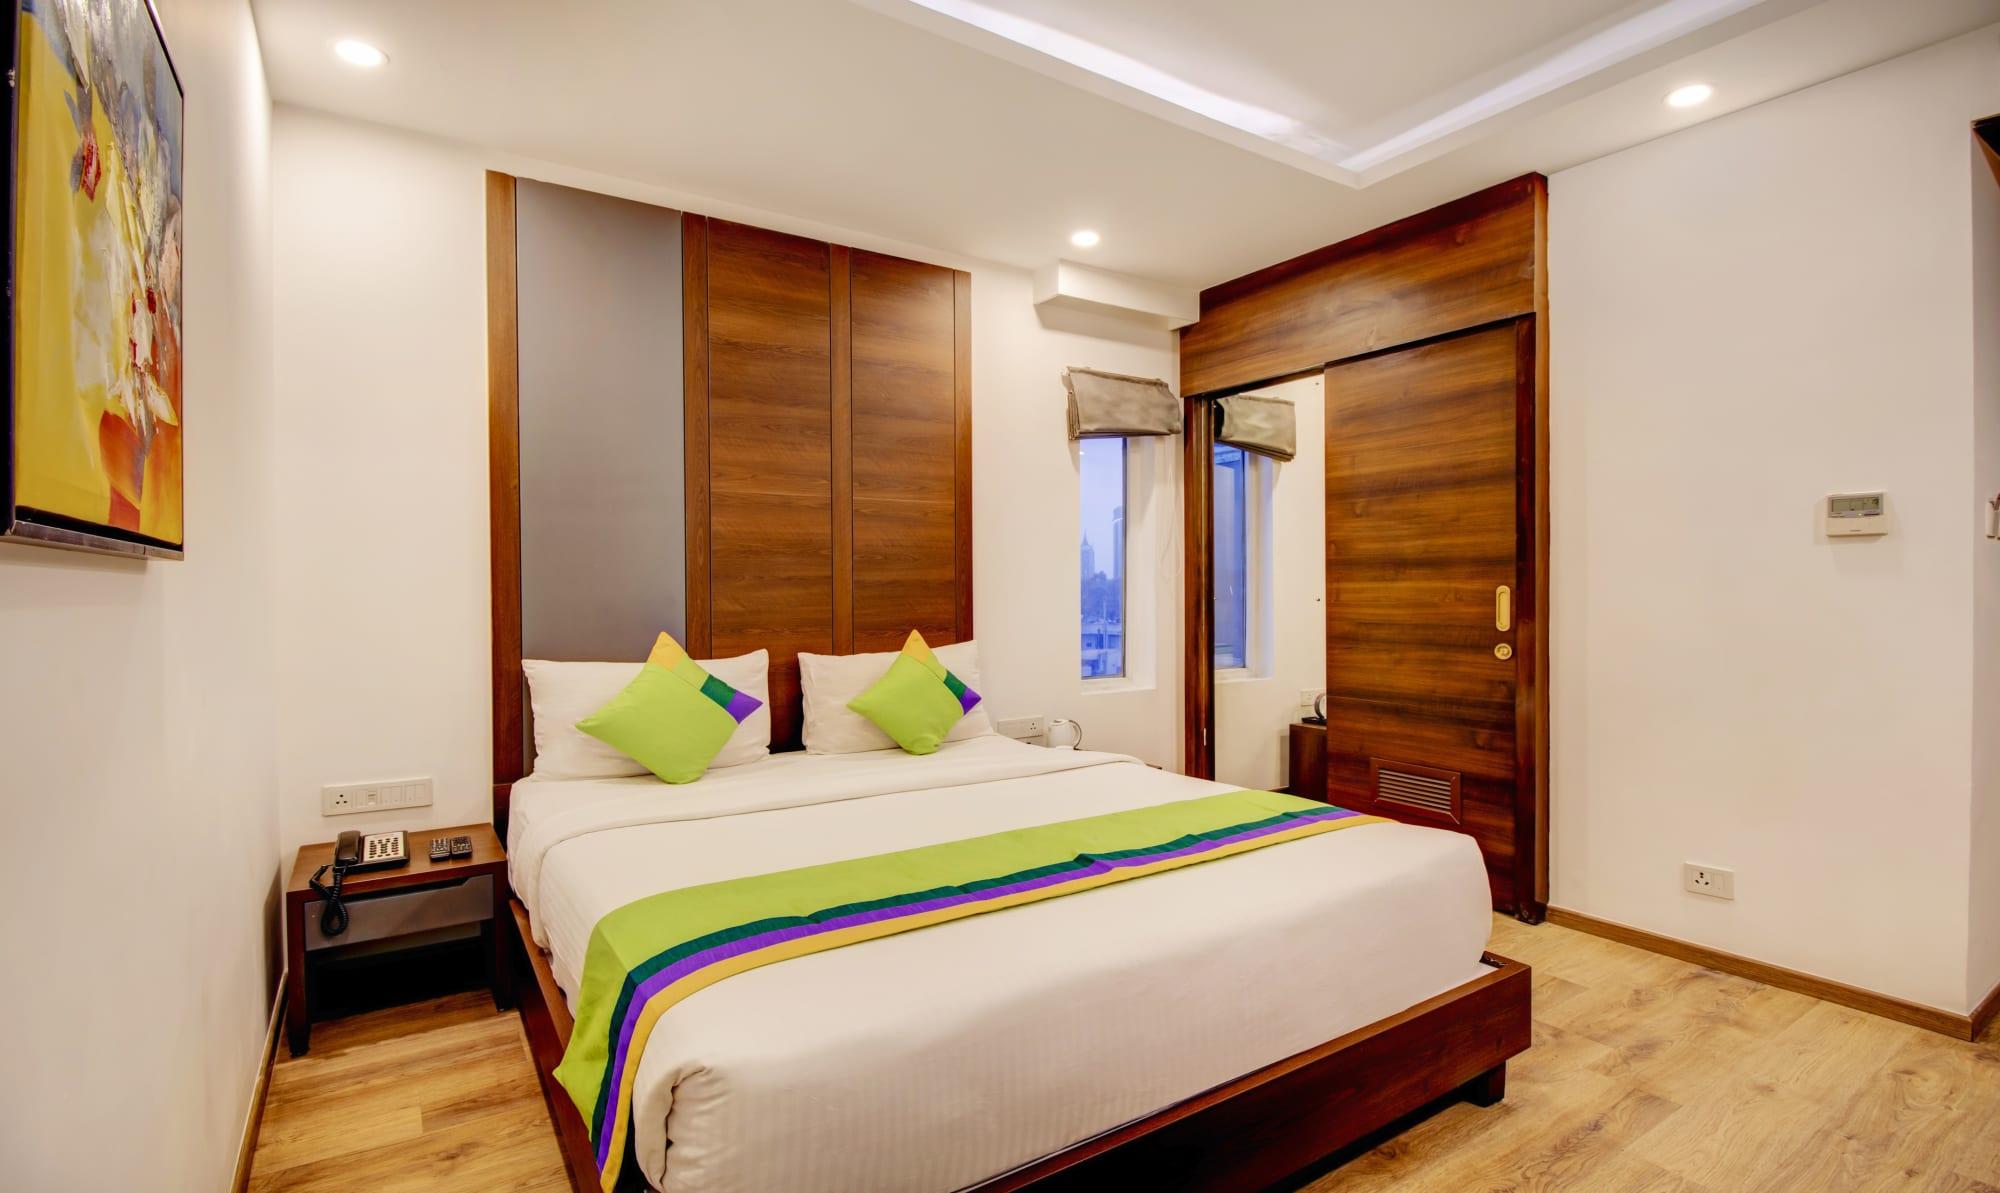 Hotel Treebo Trend Stylotel By Jagdish Bengaluru Trivago In